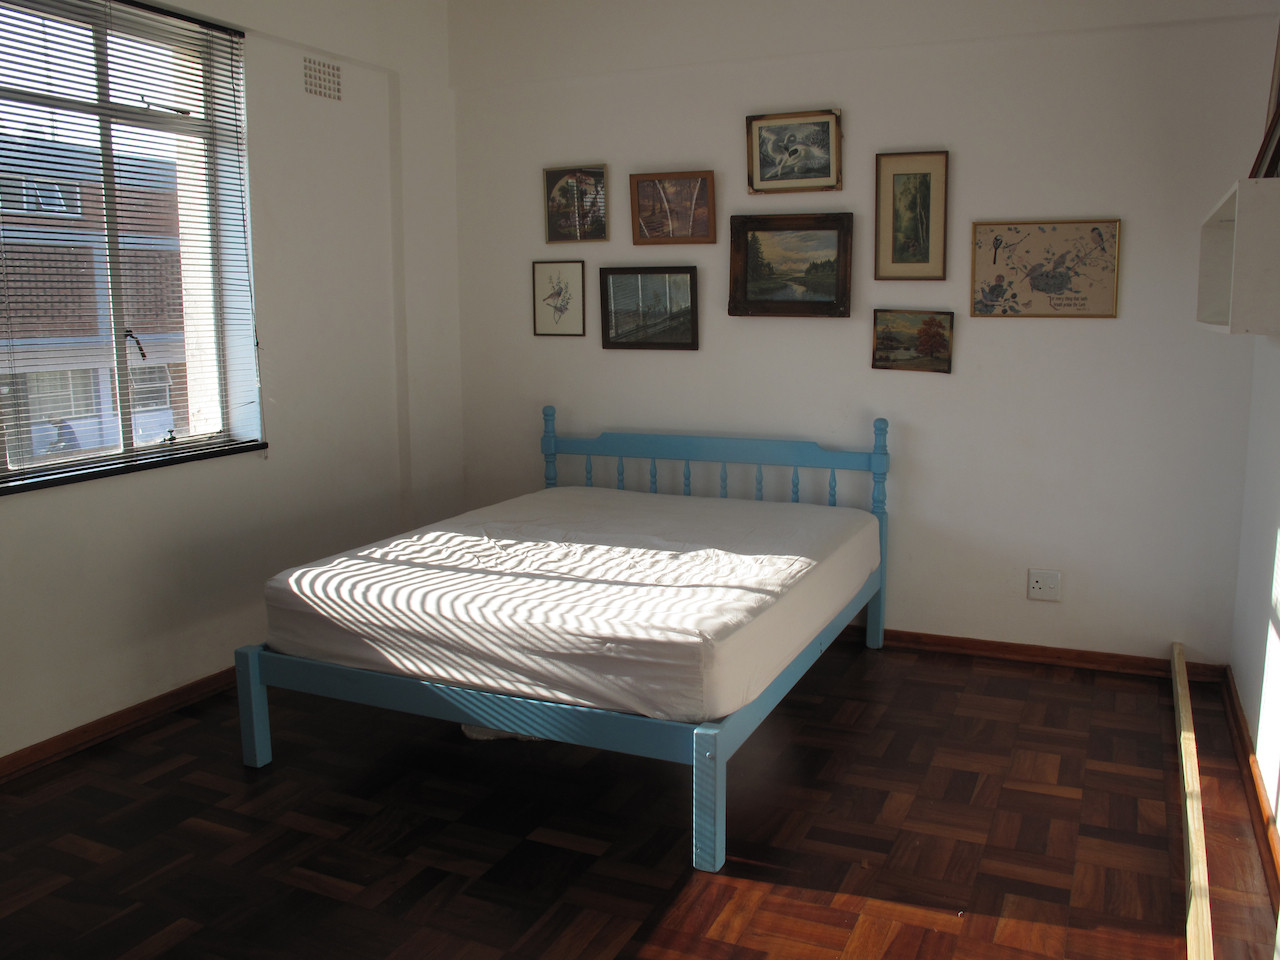 Habitación original / Imgur